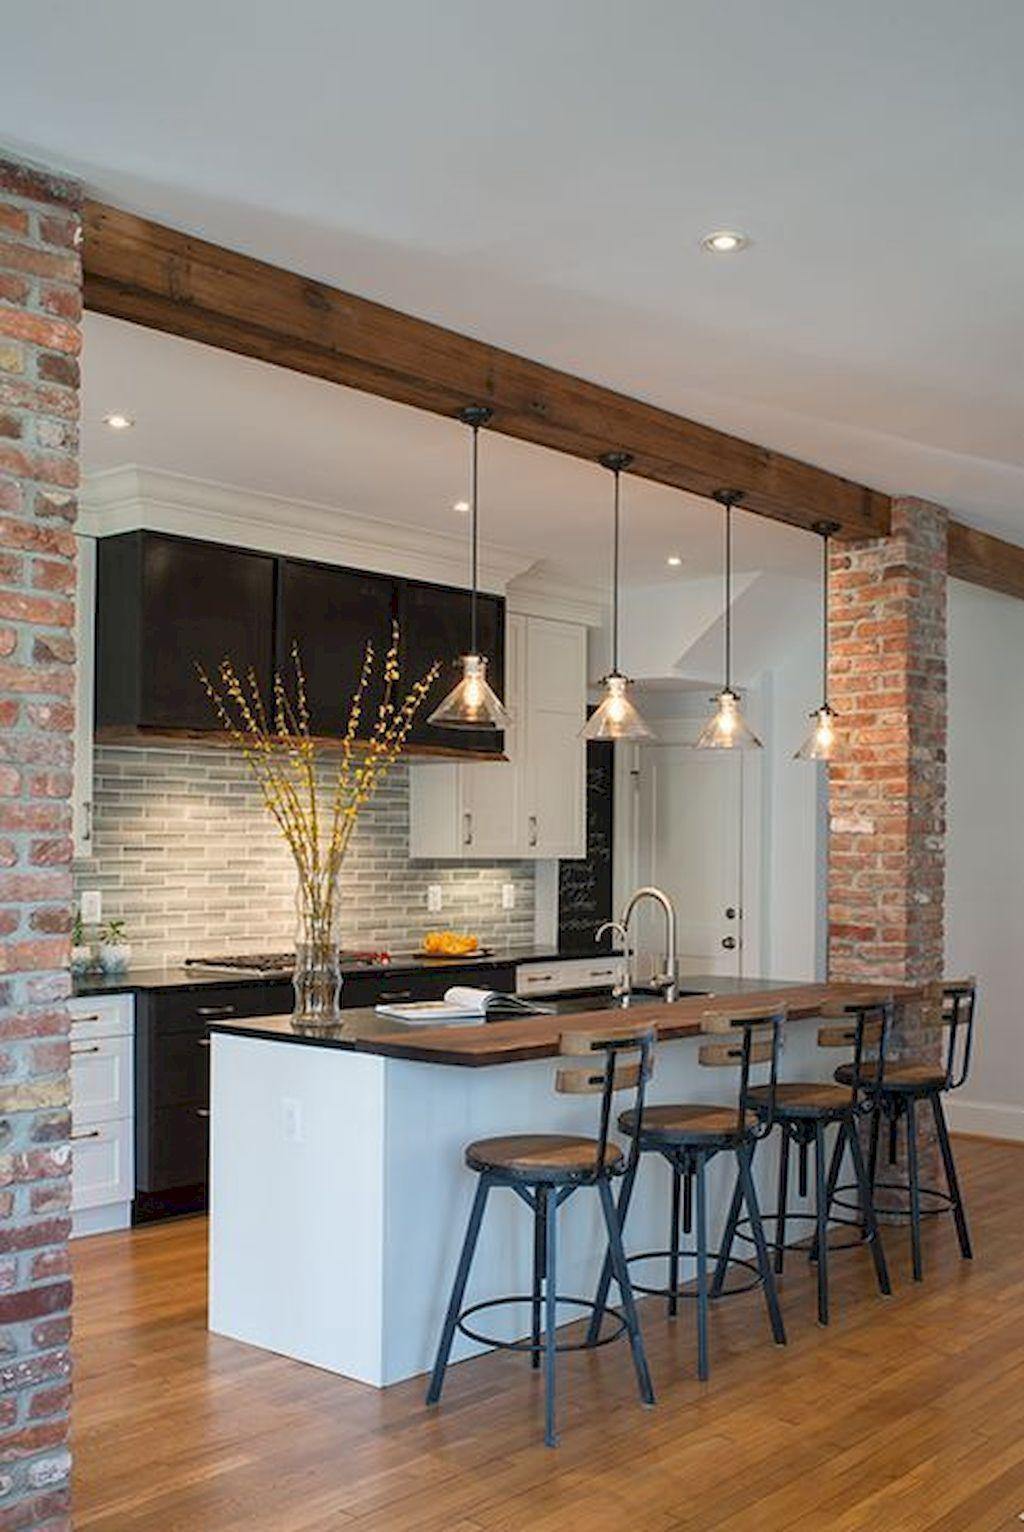 Vintage Interior Design Ideas To Convert Your Home Kitchen Tiles